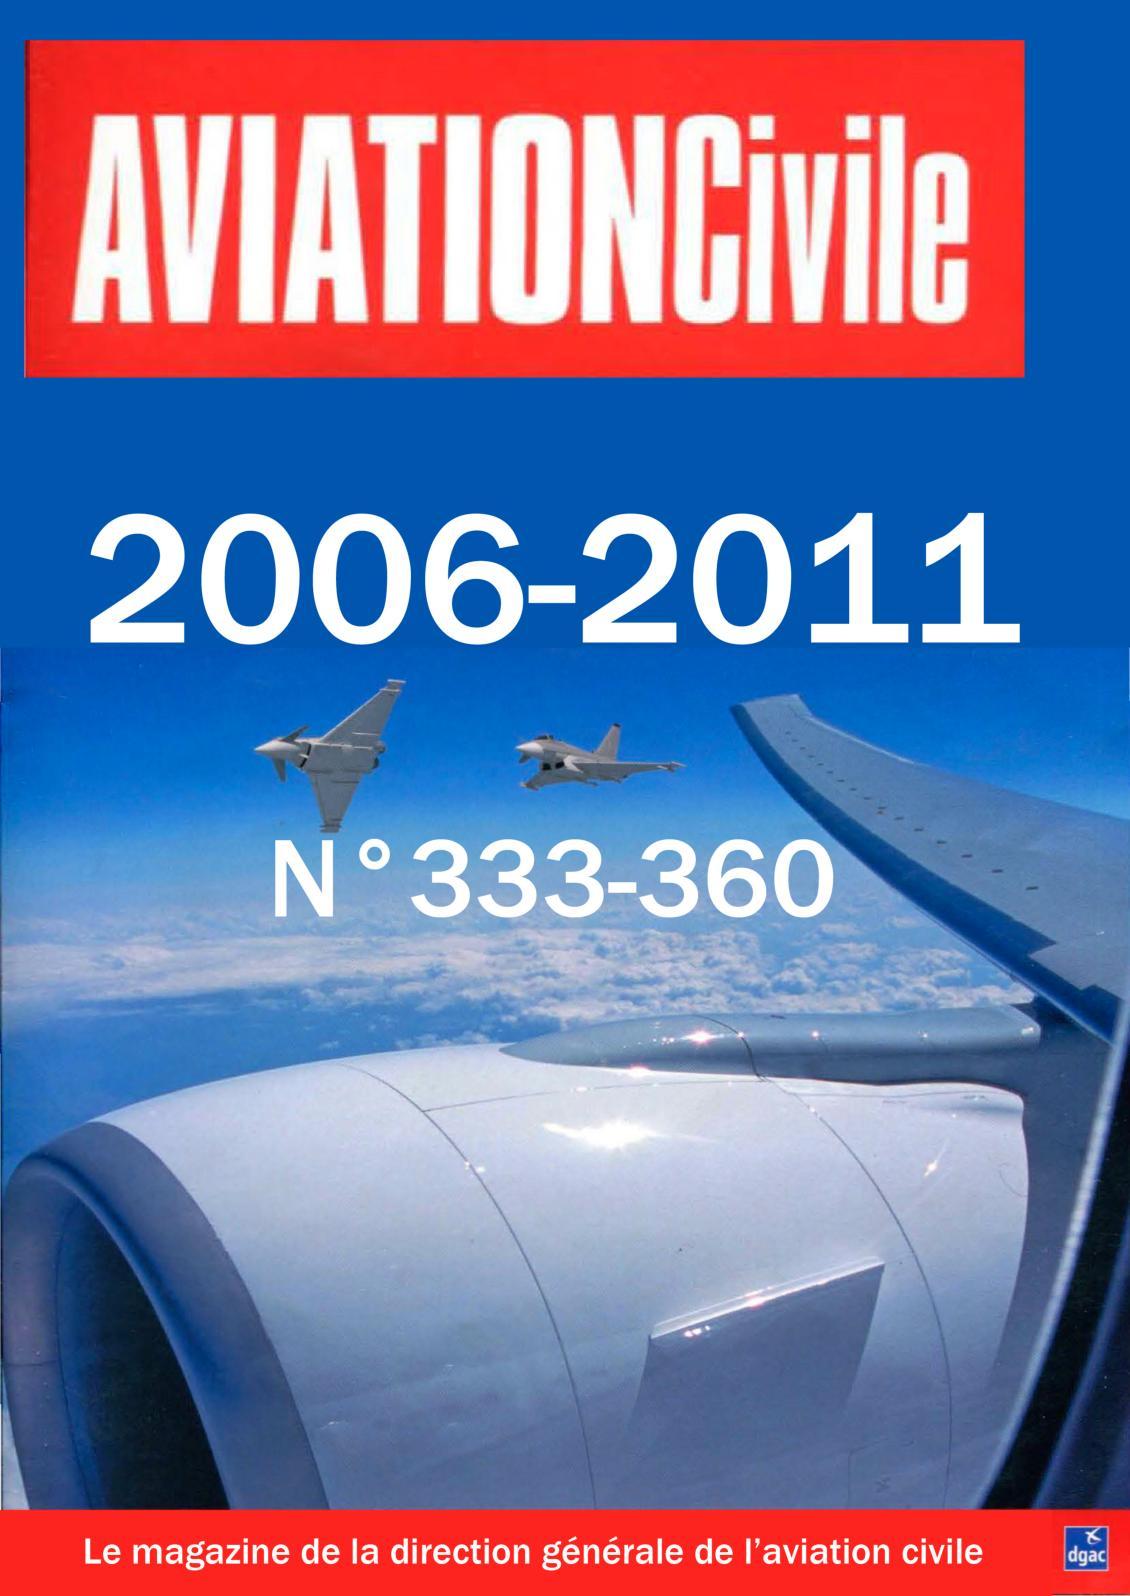 Calaméo - 2006 2011 Aviation Civile 333 360 b39d4278768e